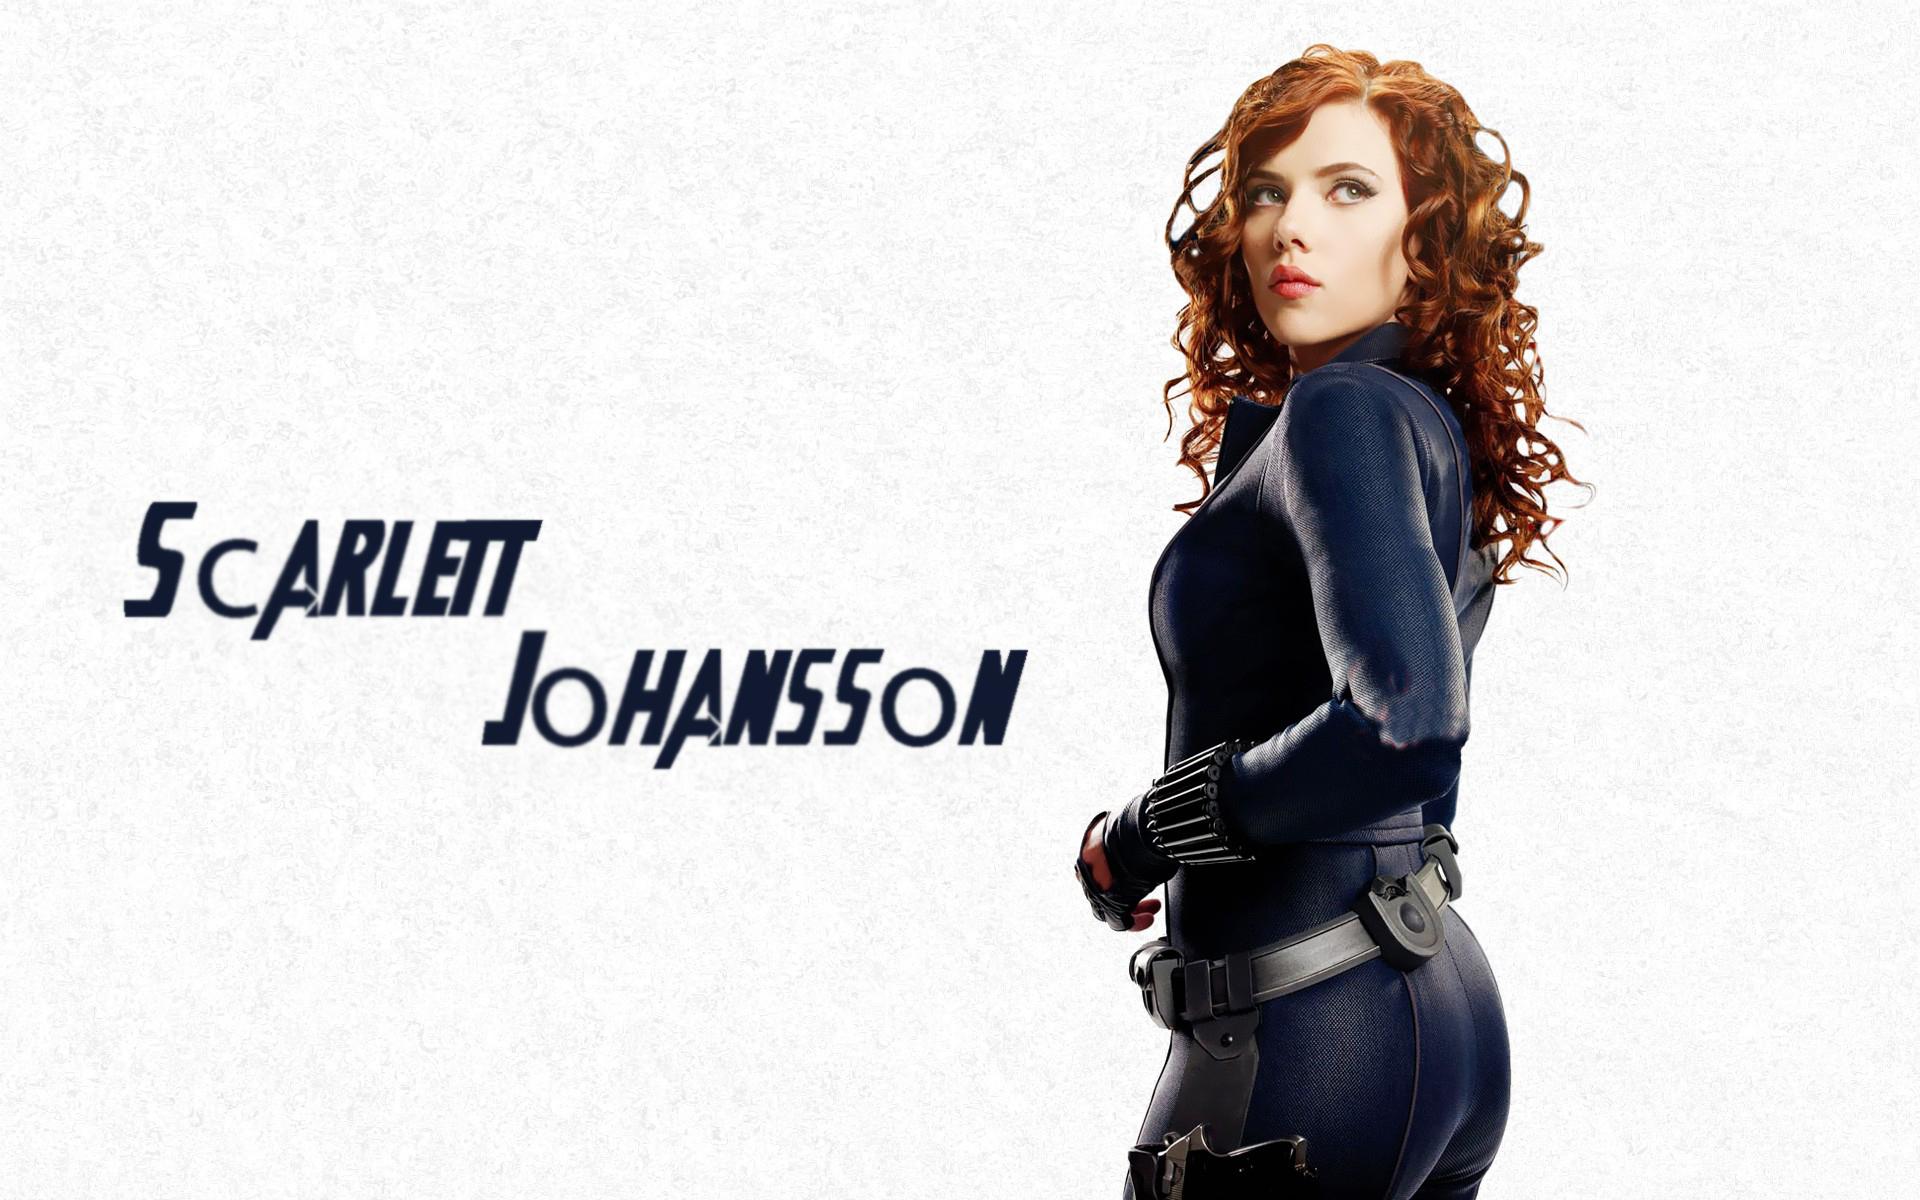 The Avengers Scarlett Johansson Black Widow Wallpaper Scarlett Johansson In Avengers Movie 1502165 Hd Wallpaper Backgrounds Download